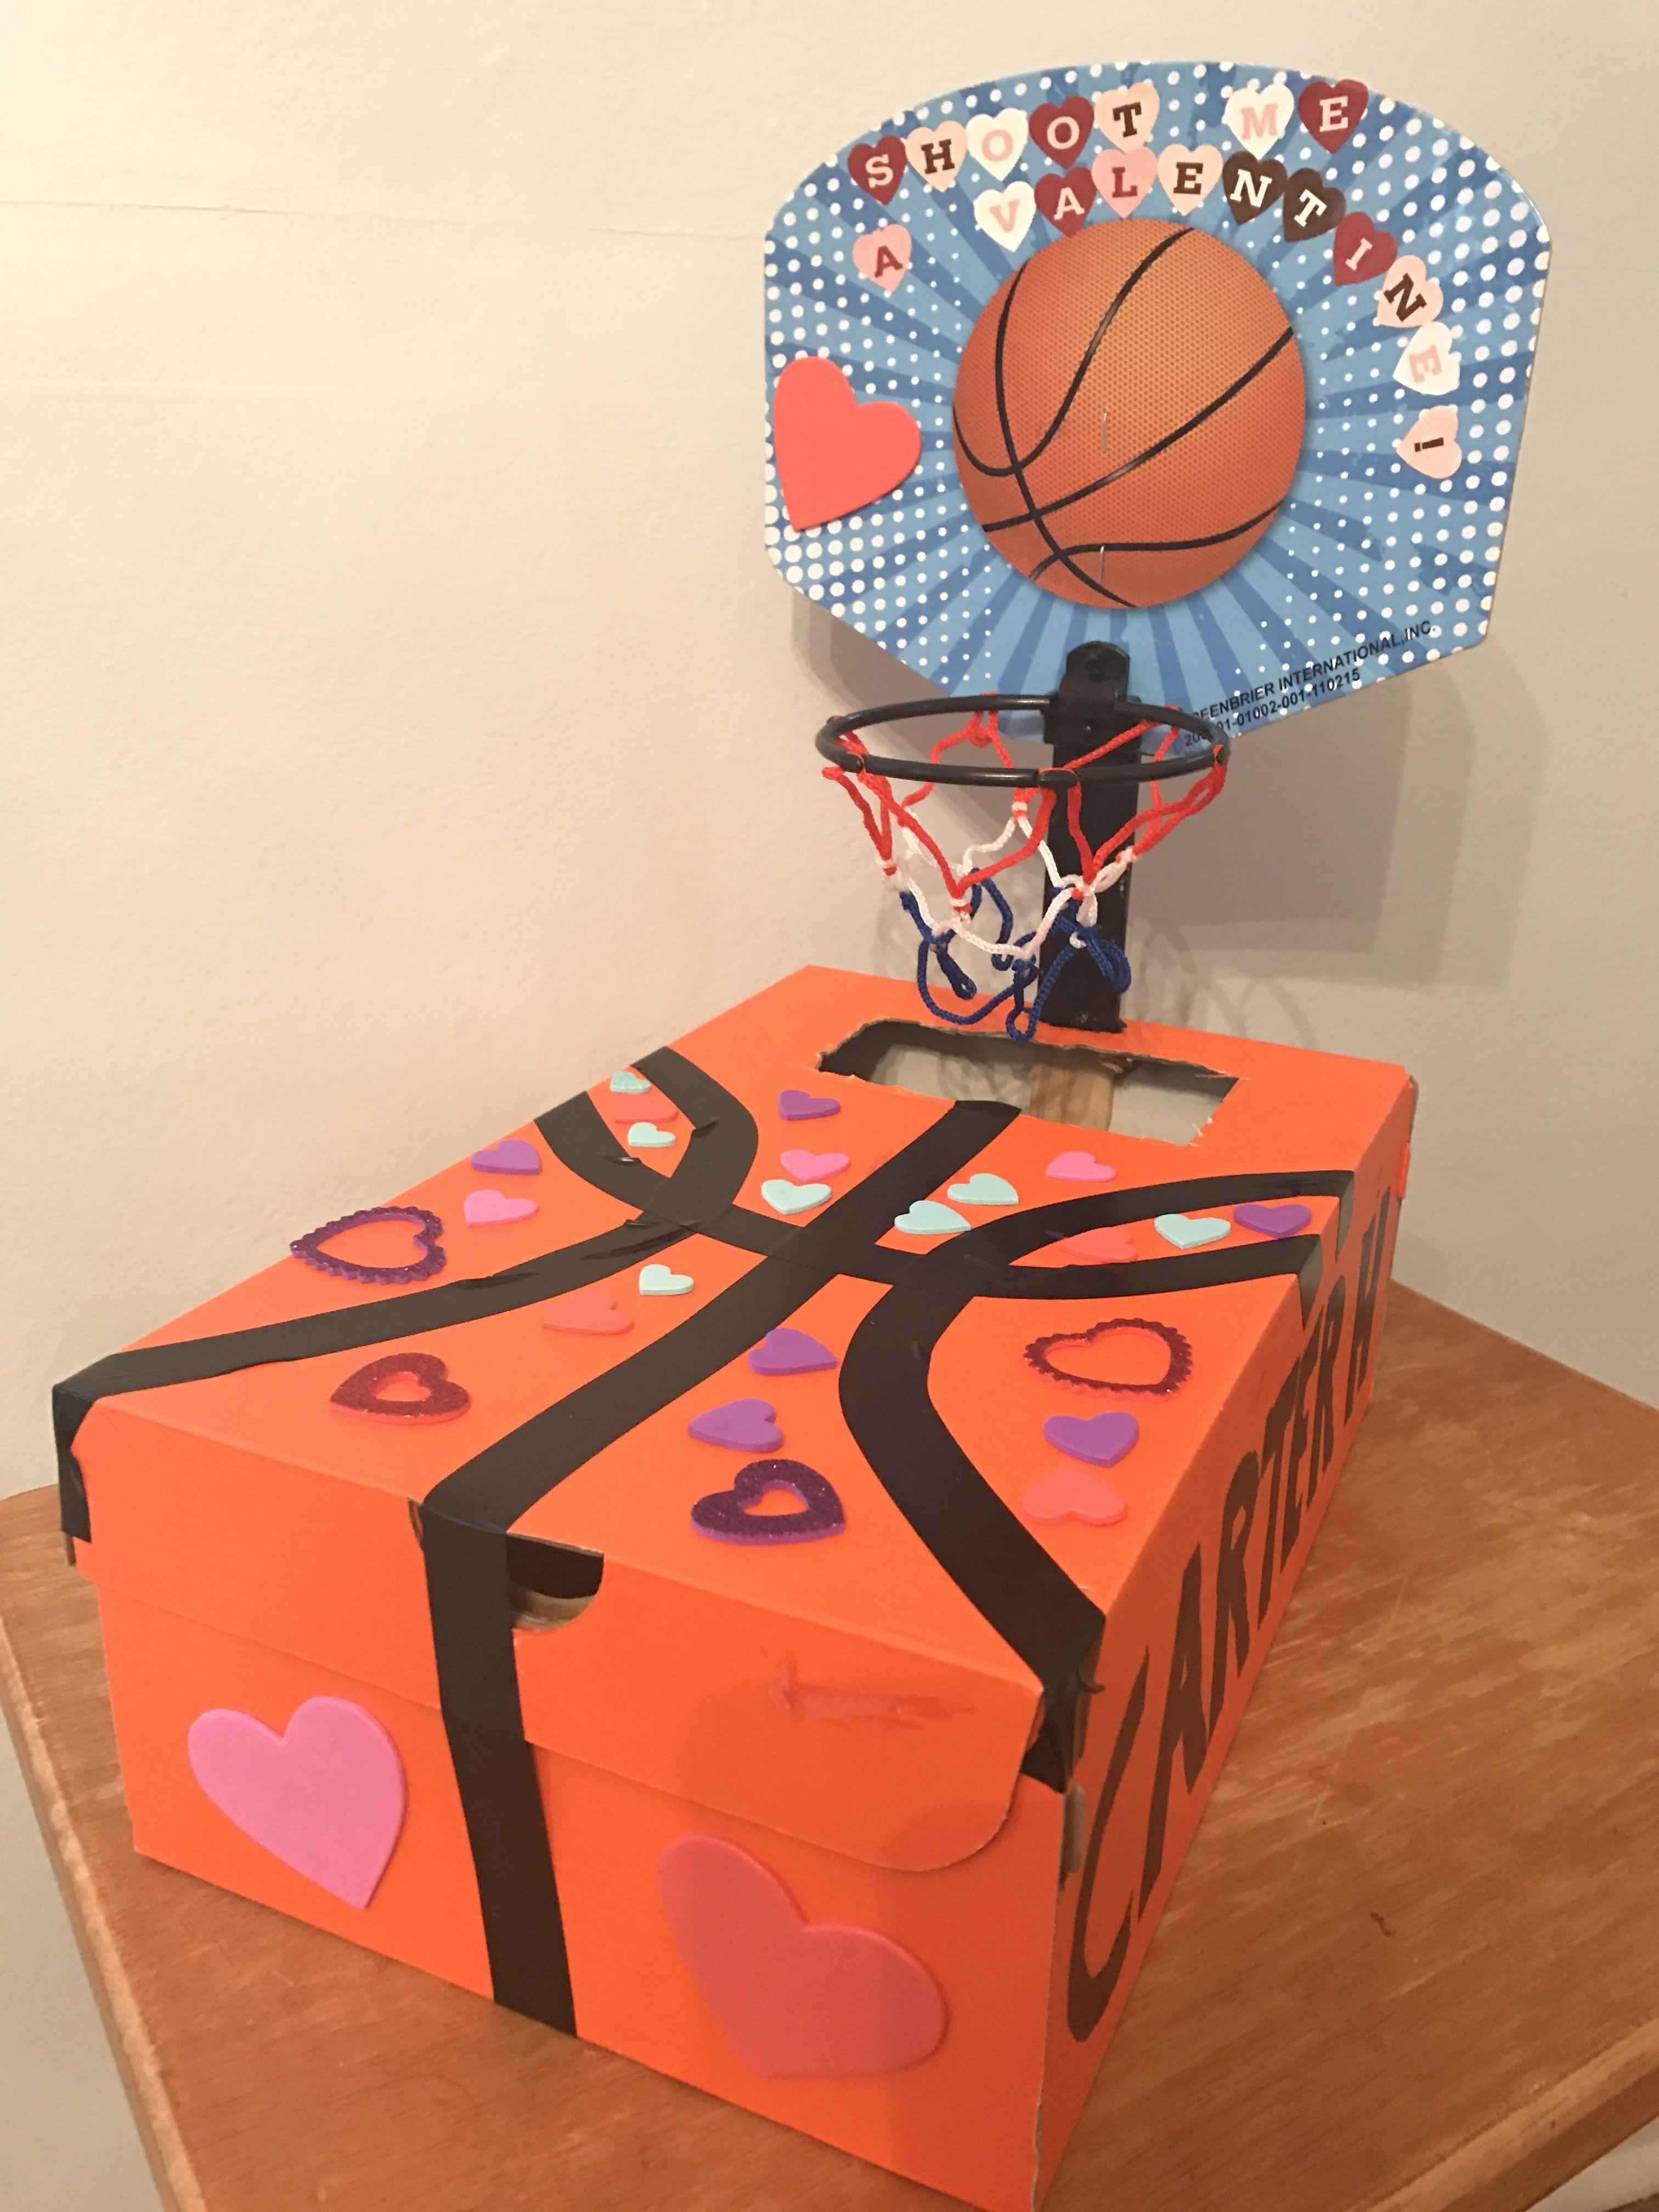 Basketball Valentine S Day Box Shoot Me A Valentine Nike Box Dollar Tree B Ball Hoop E Boys Valentines Boxes Basketball Valentine Boxes Valentine Day Boxes